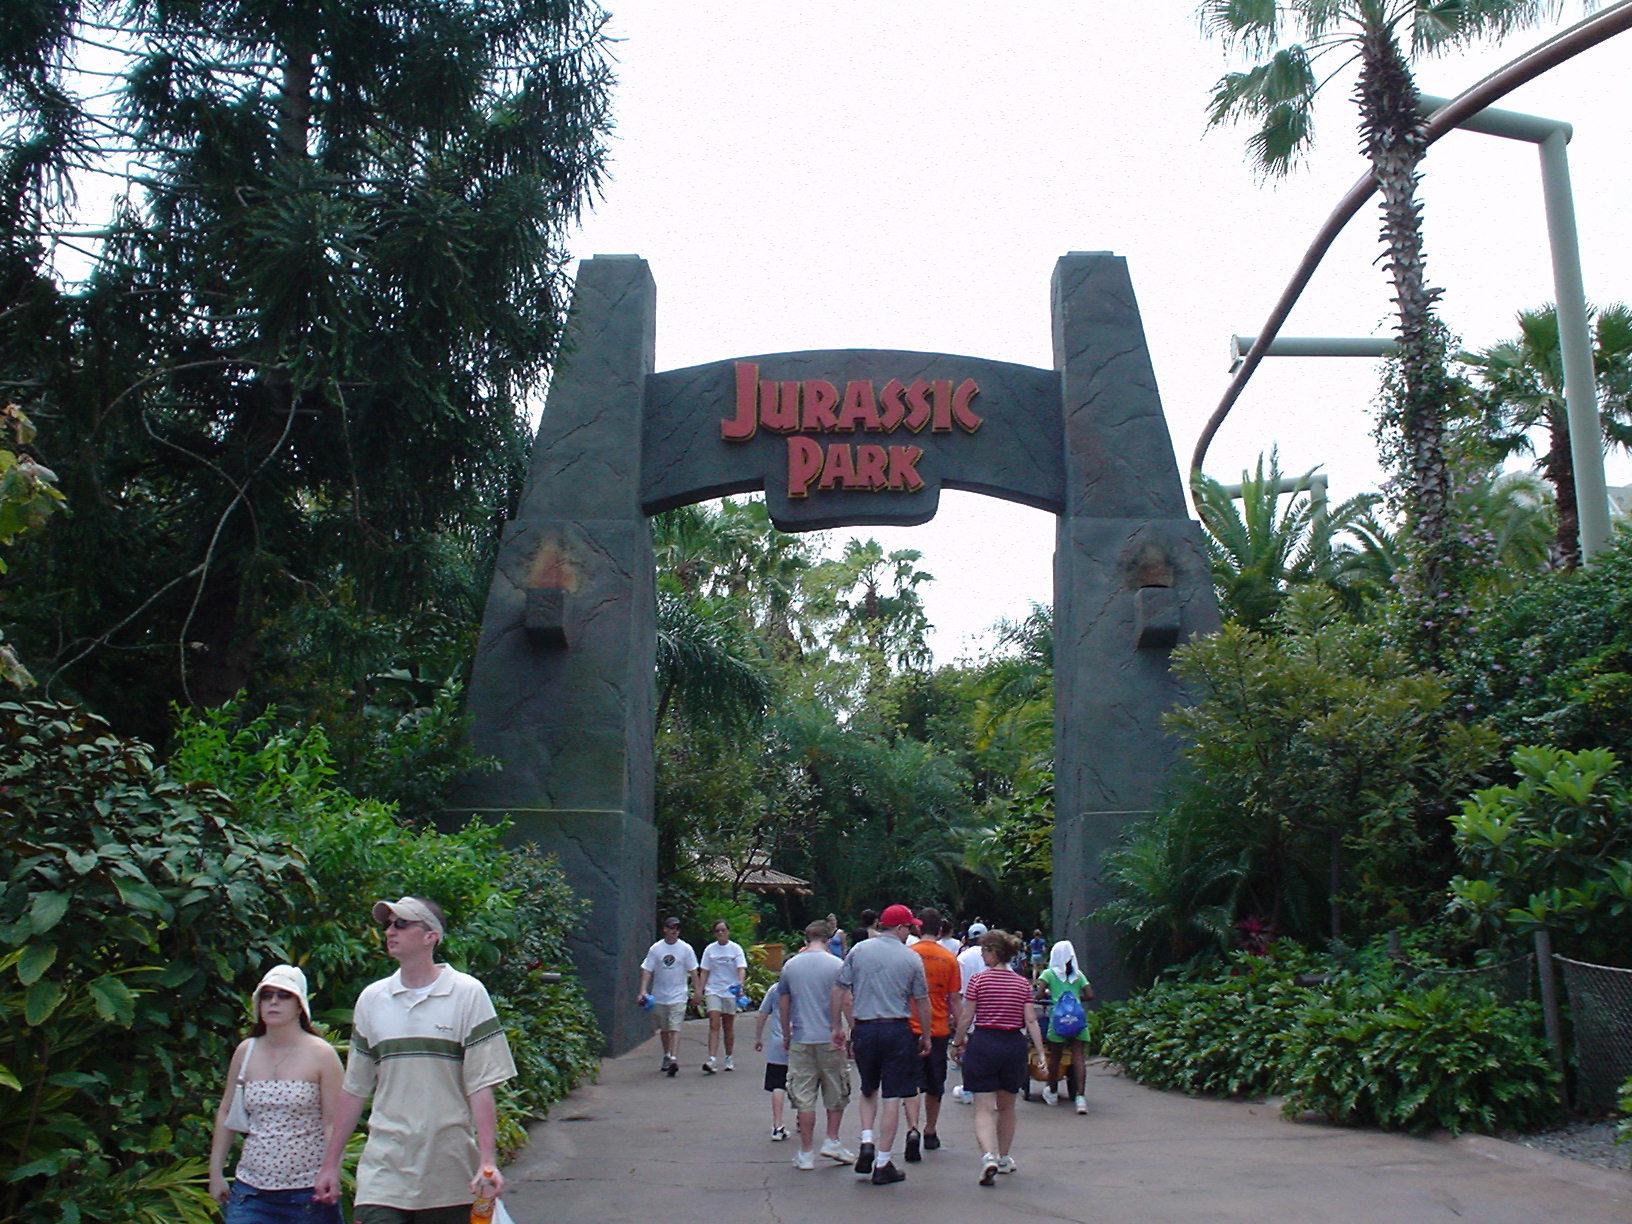 Jurasic Park Universal Studios Florida